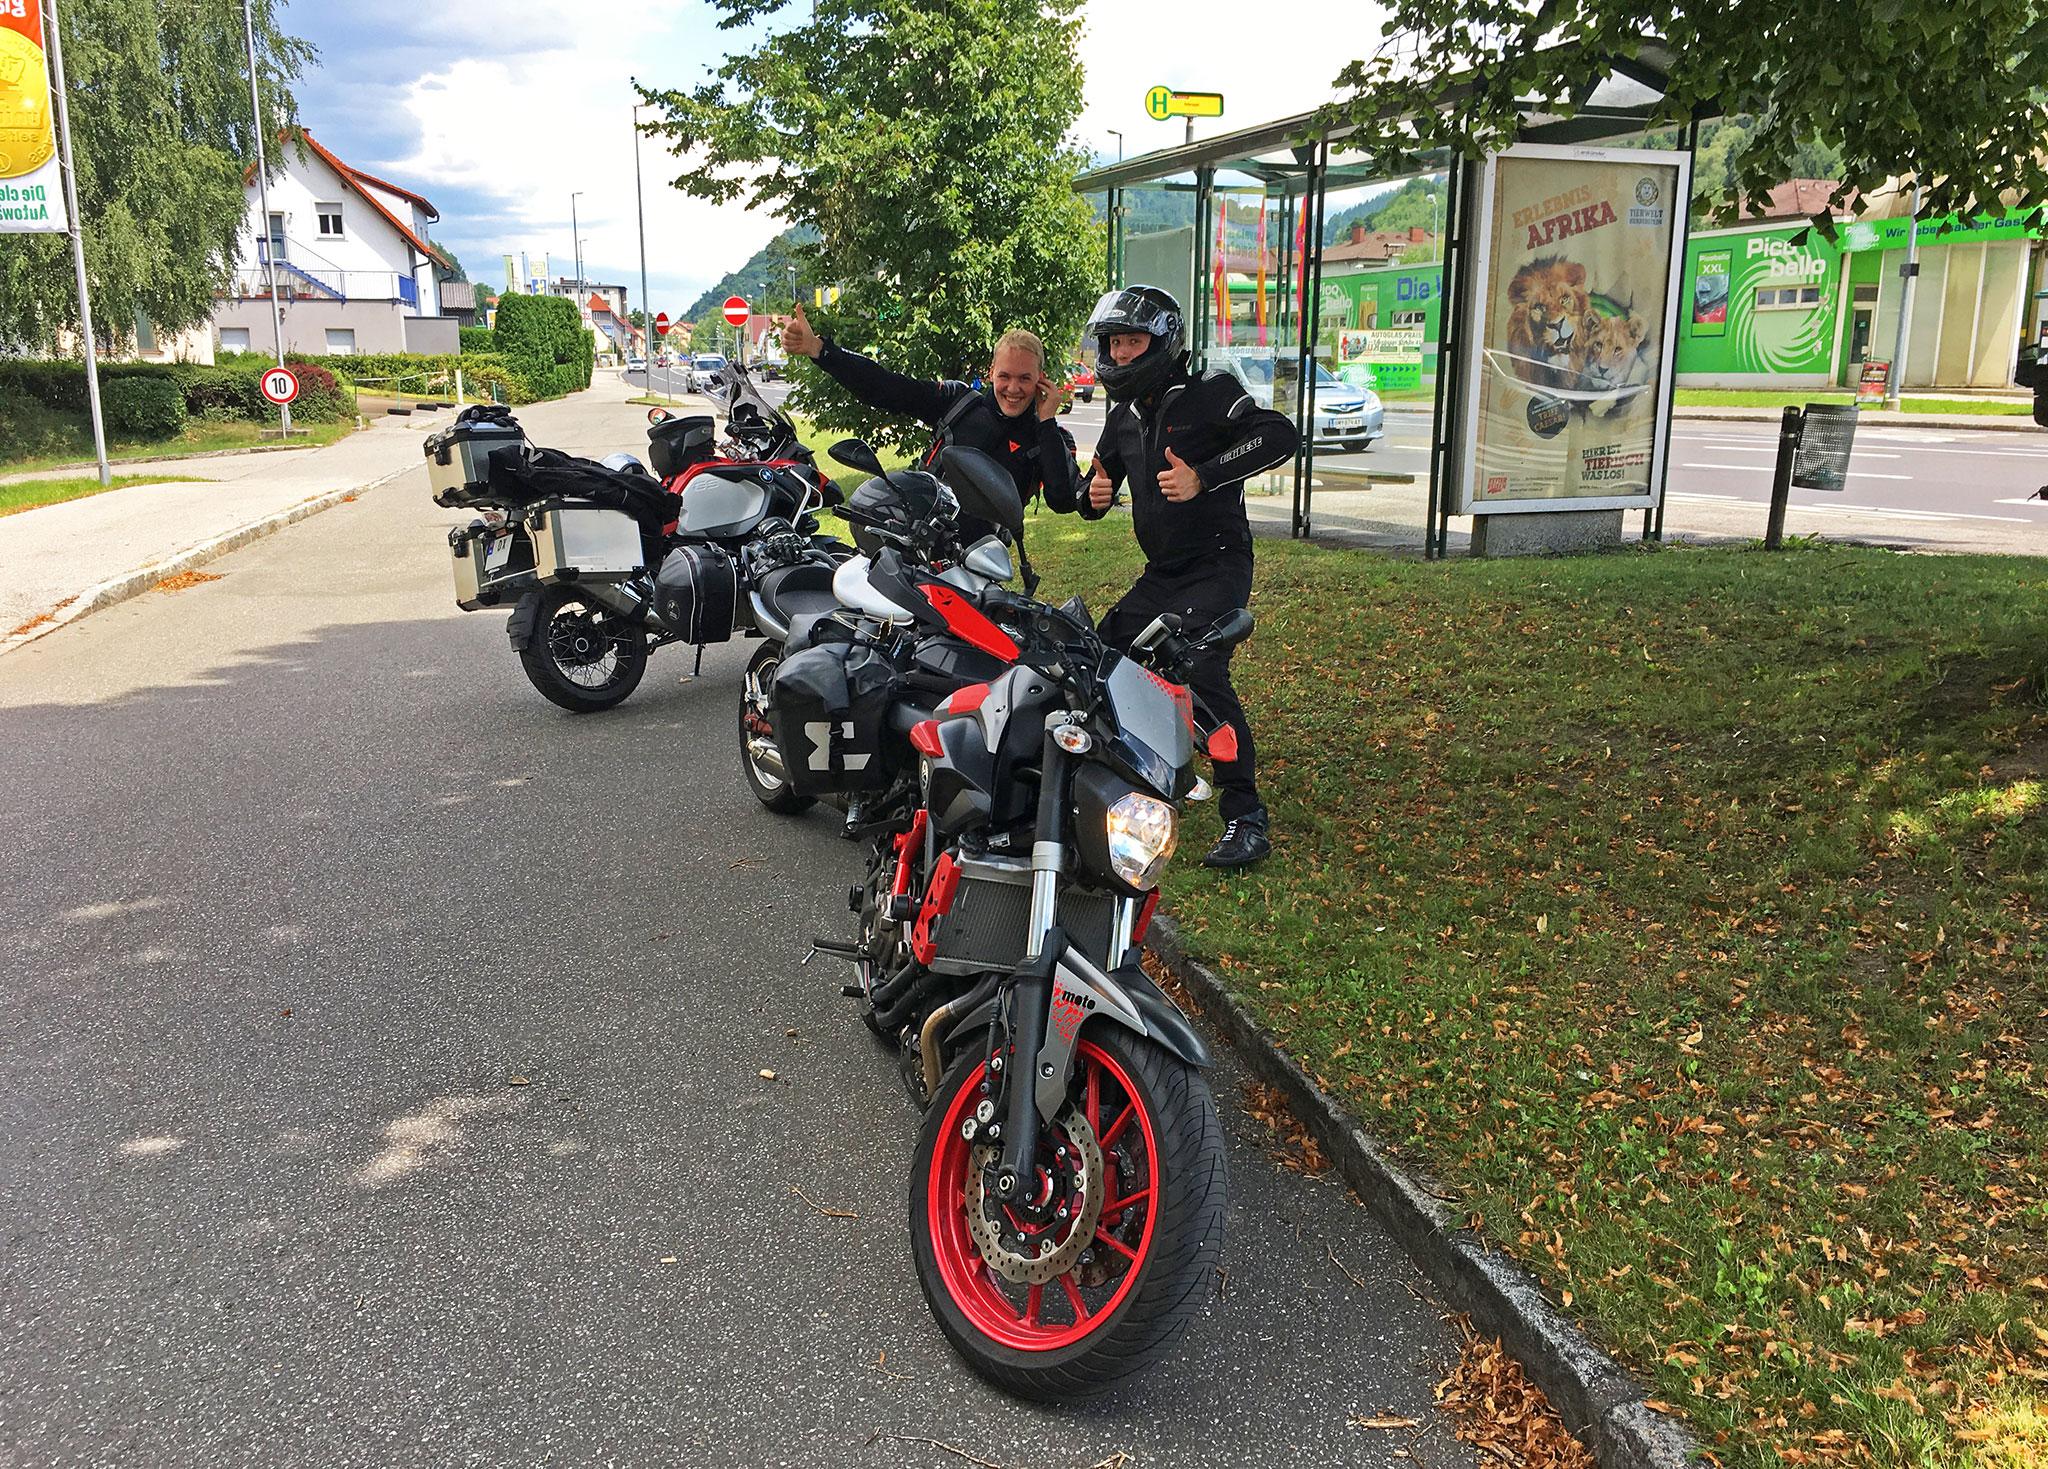 Young MC Riders roadside